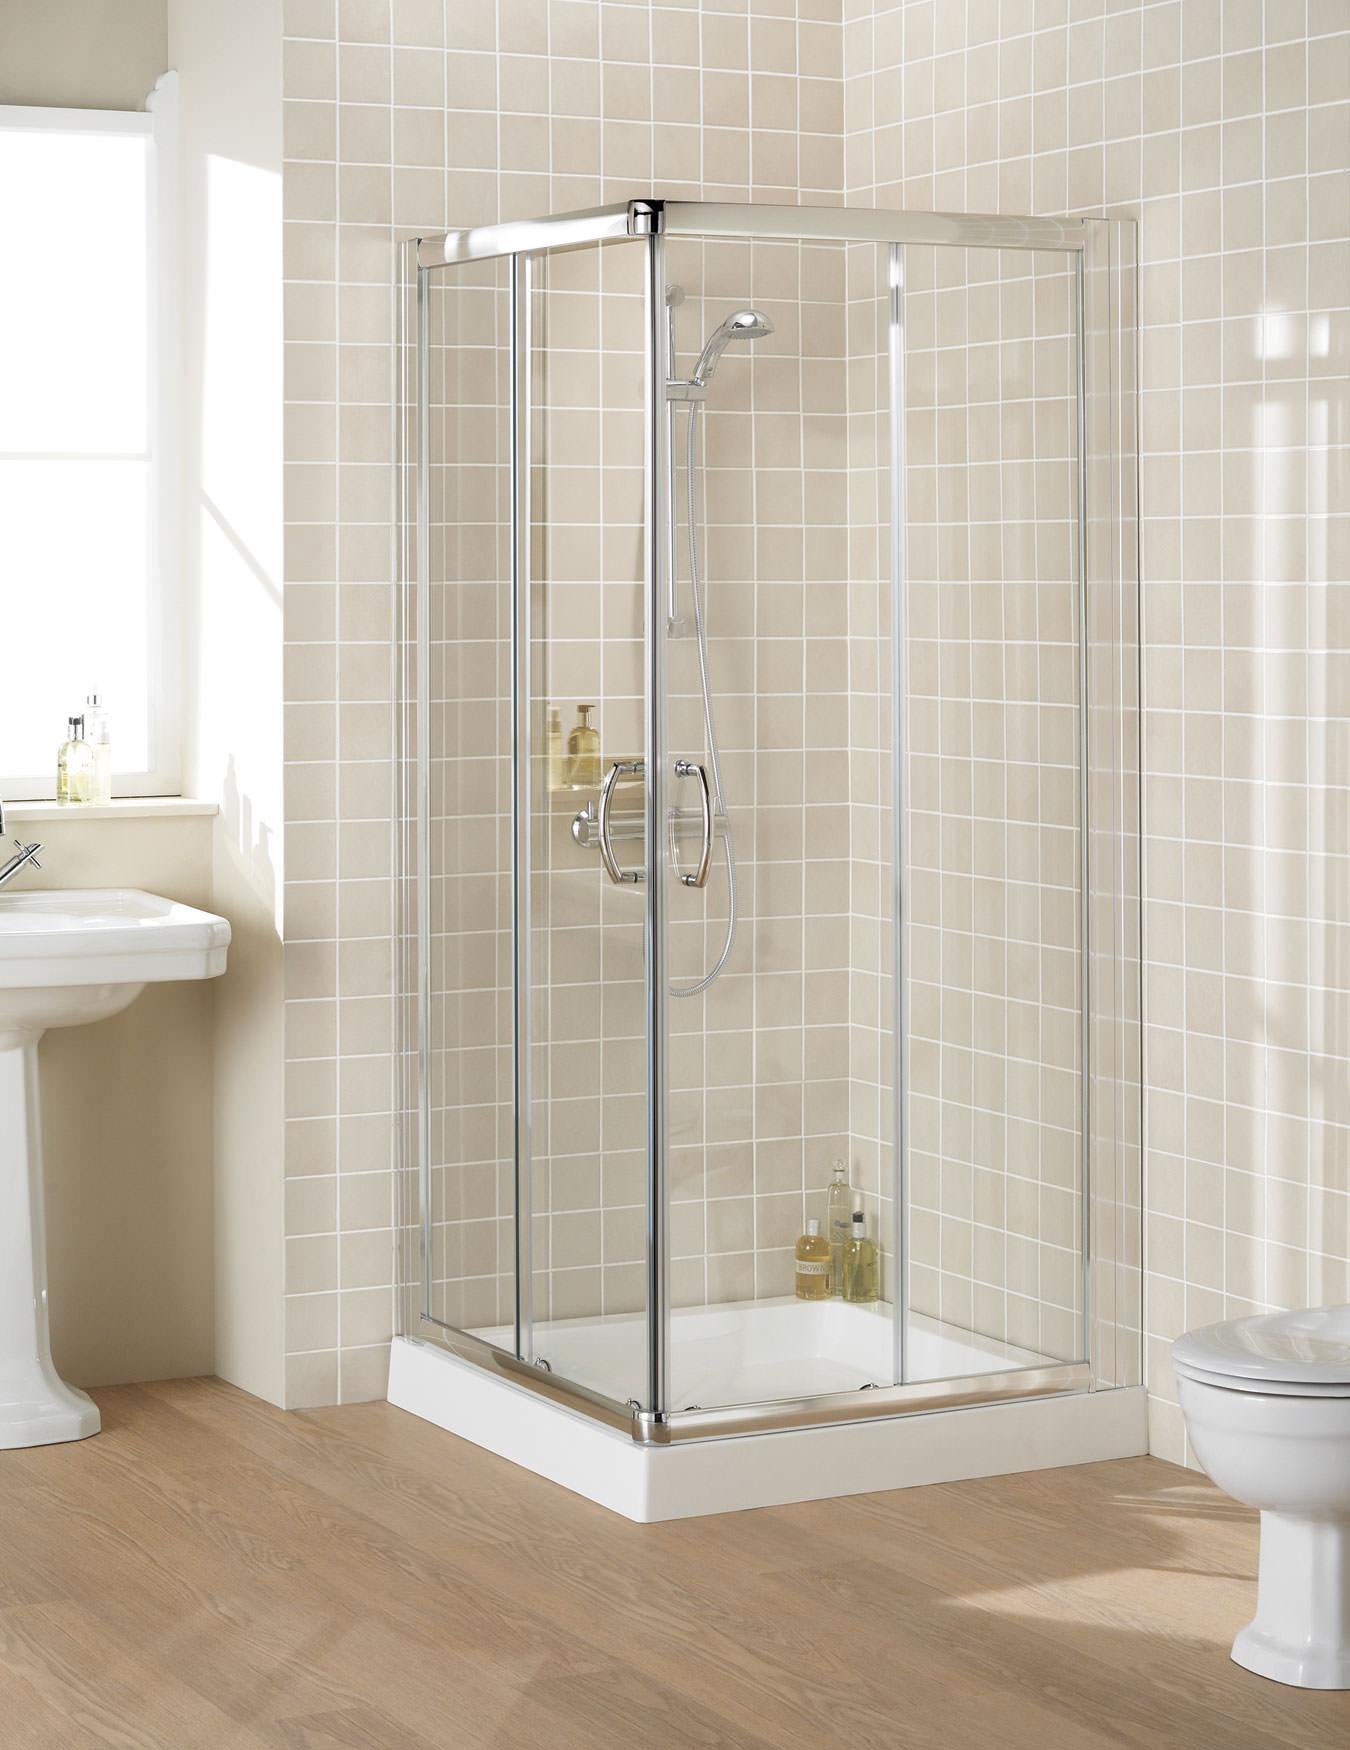 Lakes Classic Semi Frameless Corner Entry Shower Enclosure 90cm Silver